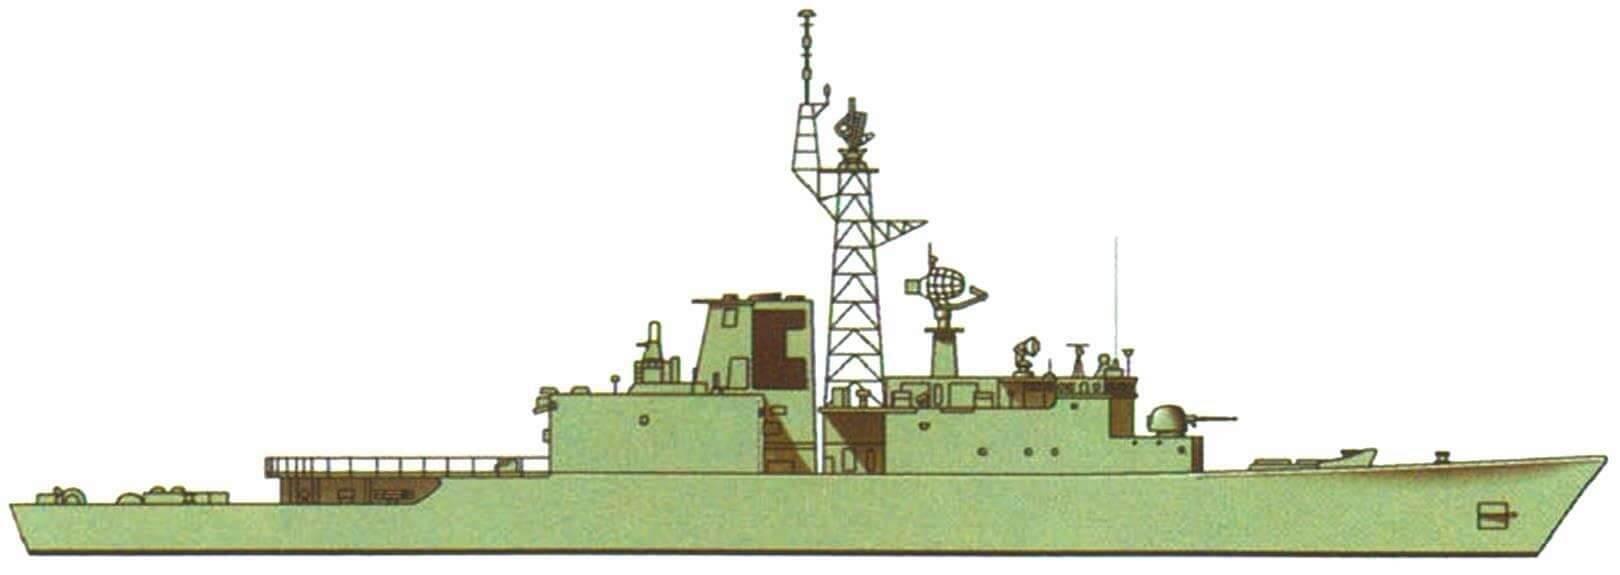 "Эсминец ""Ирокез"", Канада, 1972 г."